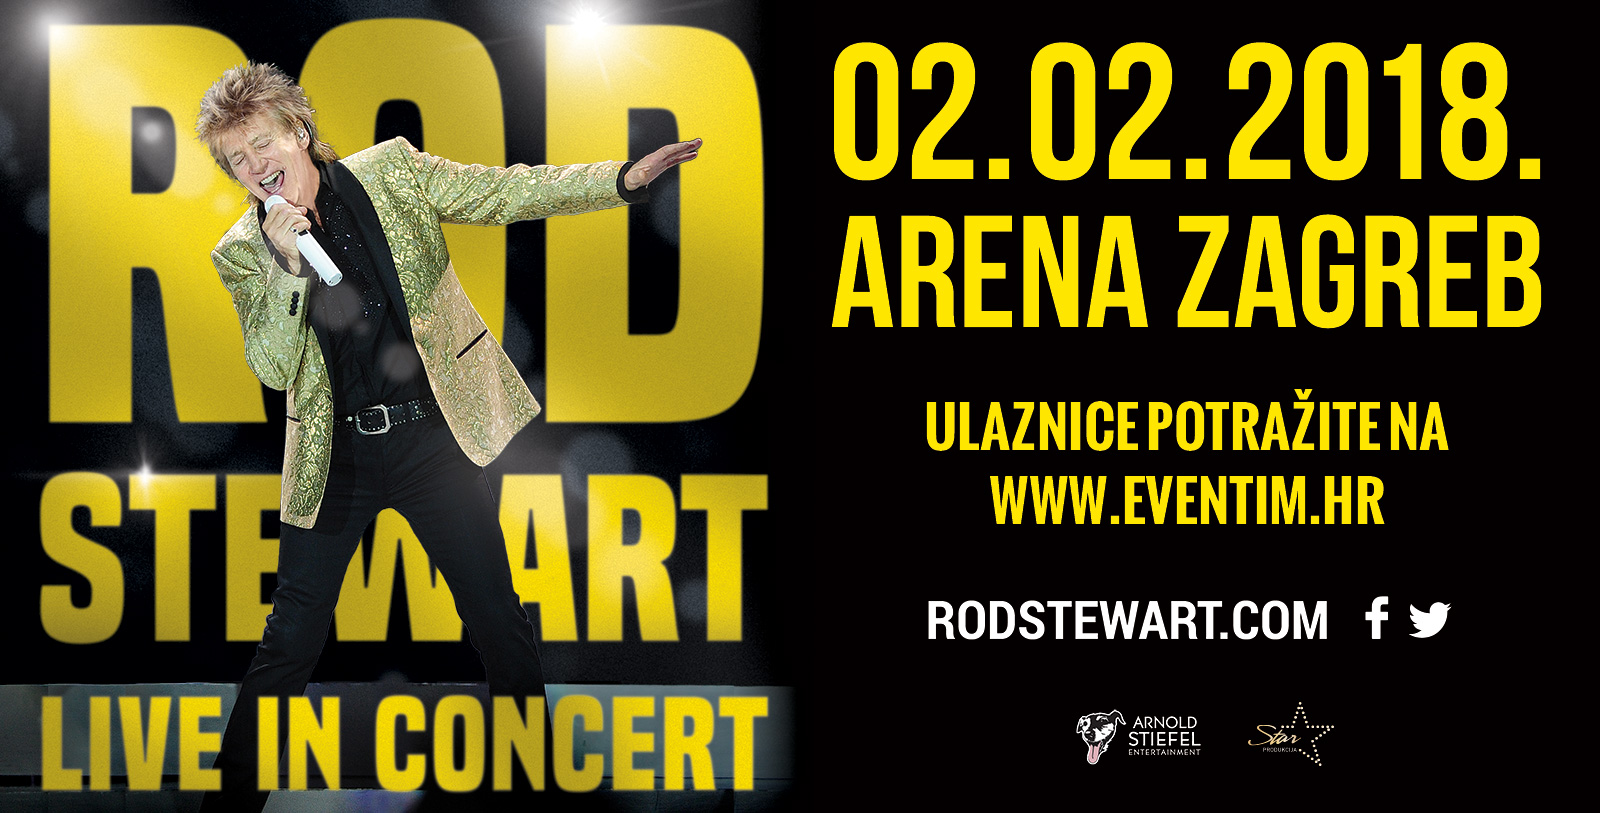 Sir Rod Stewart uskoro nastupa u Areni Zagreb